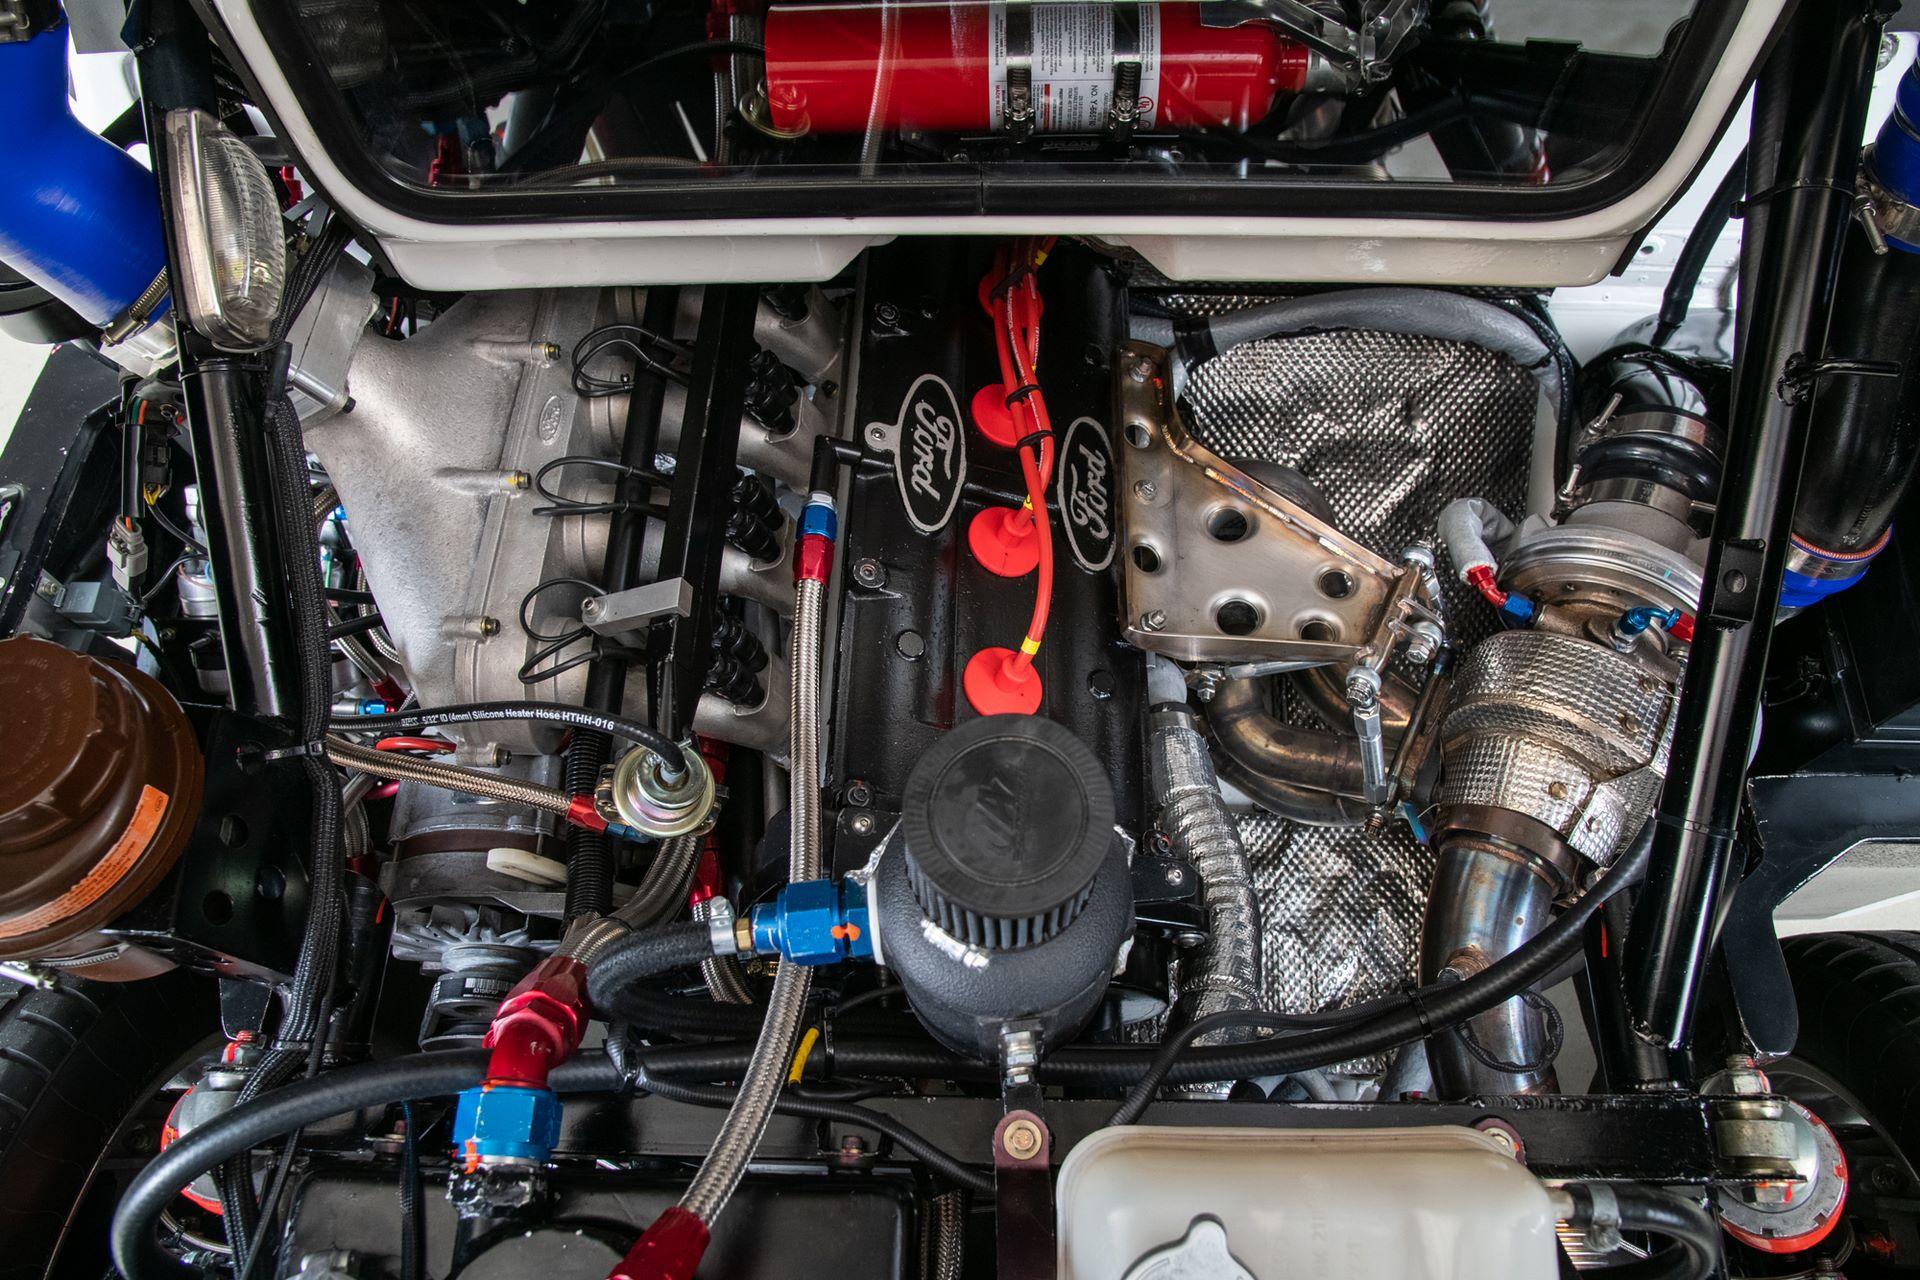 Ford-RS200-Evolution-Evo-for-sale-29